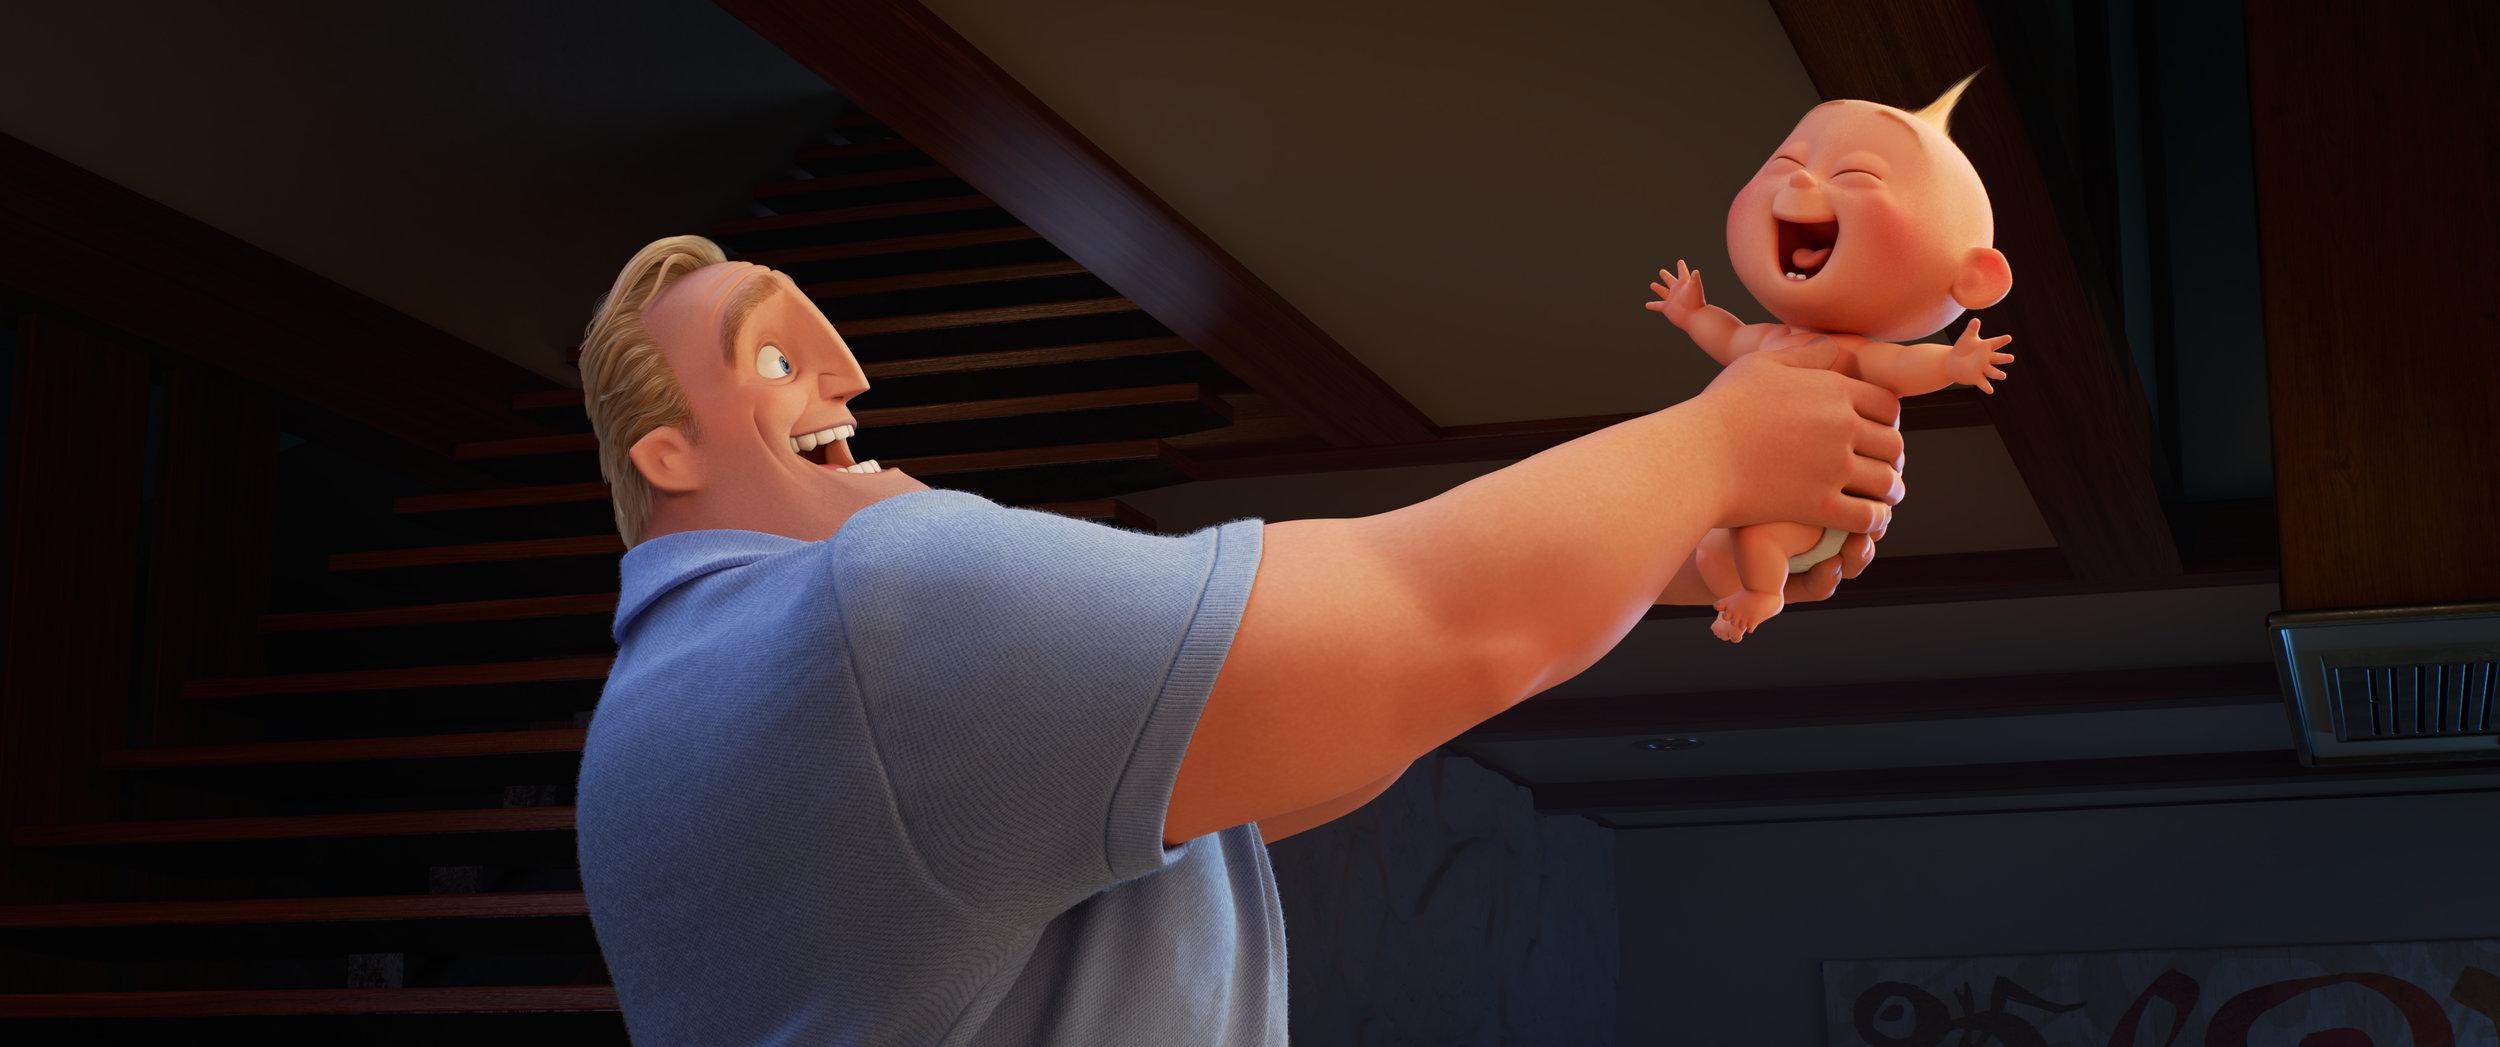 Photo courtesy Disney/Pixar